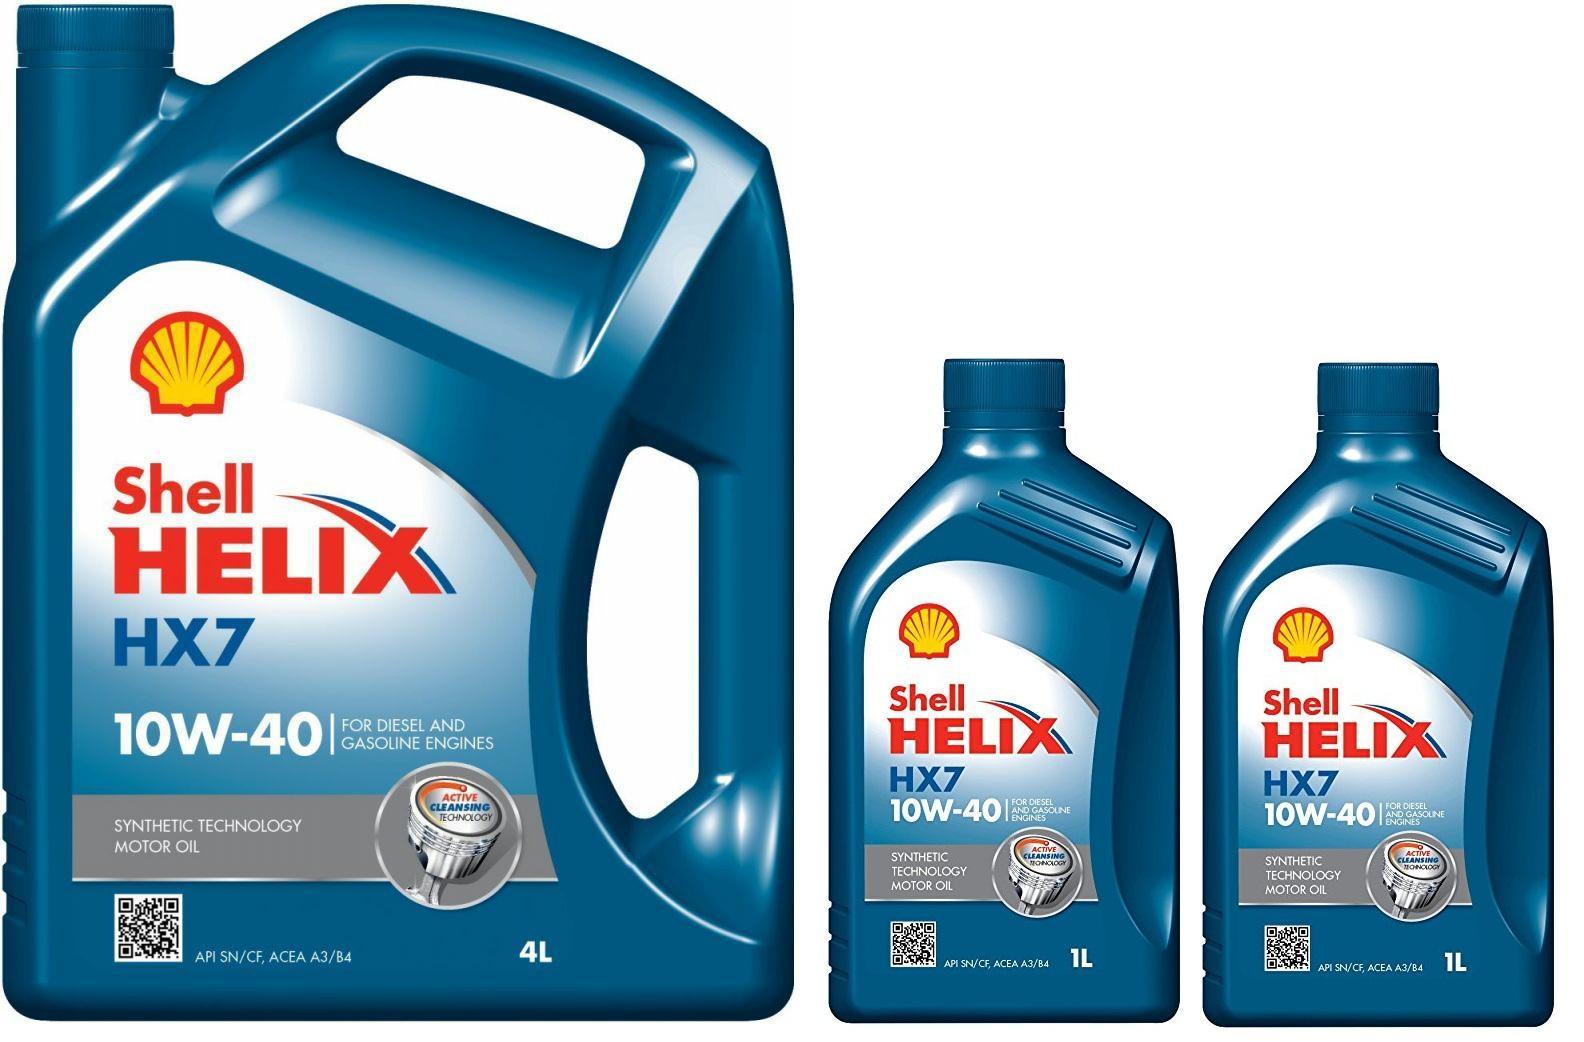 Kit cambio olio 6 LT Shell Helix HX7 10w/40 barattolo 4 litri + 2 baratt 1 litro